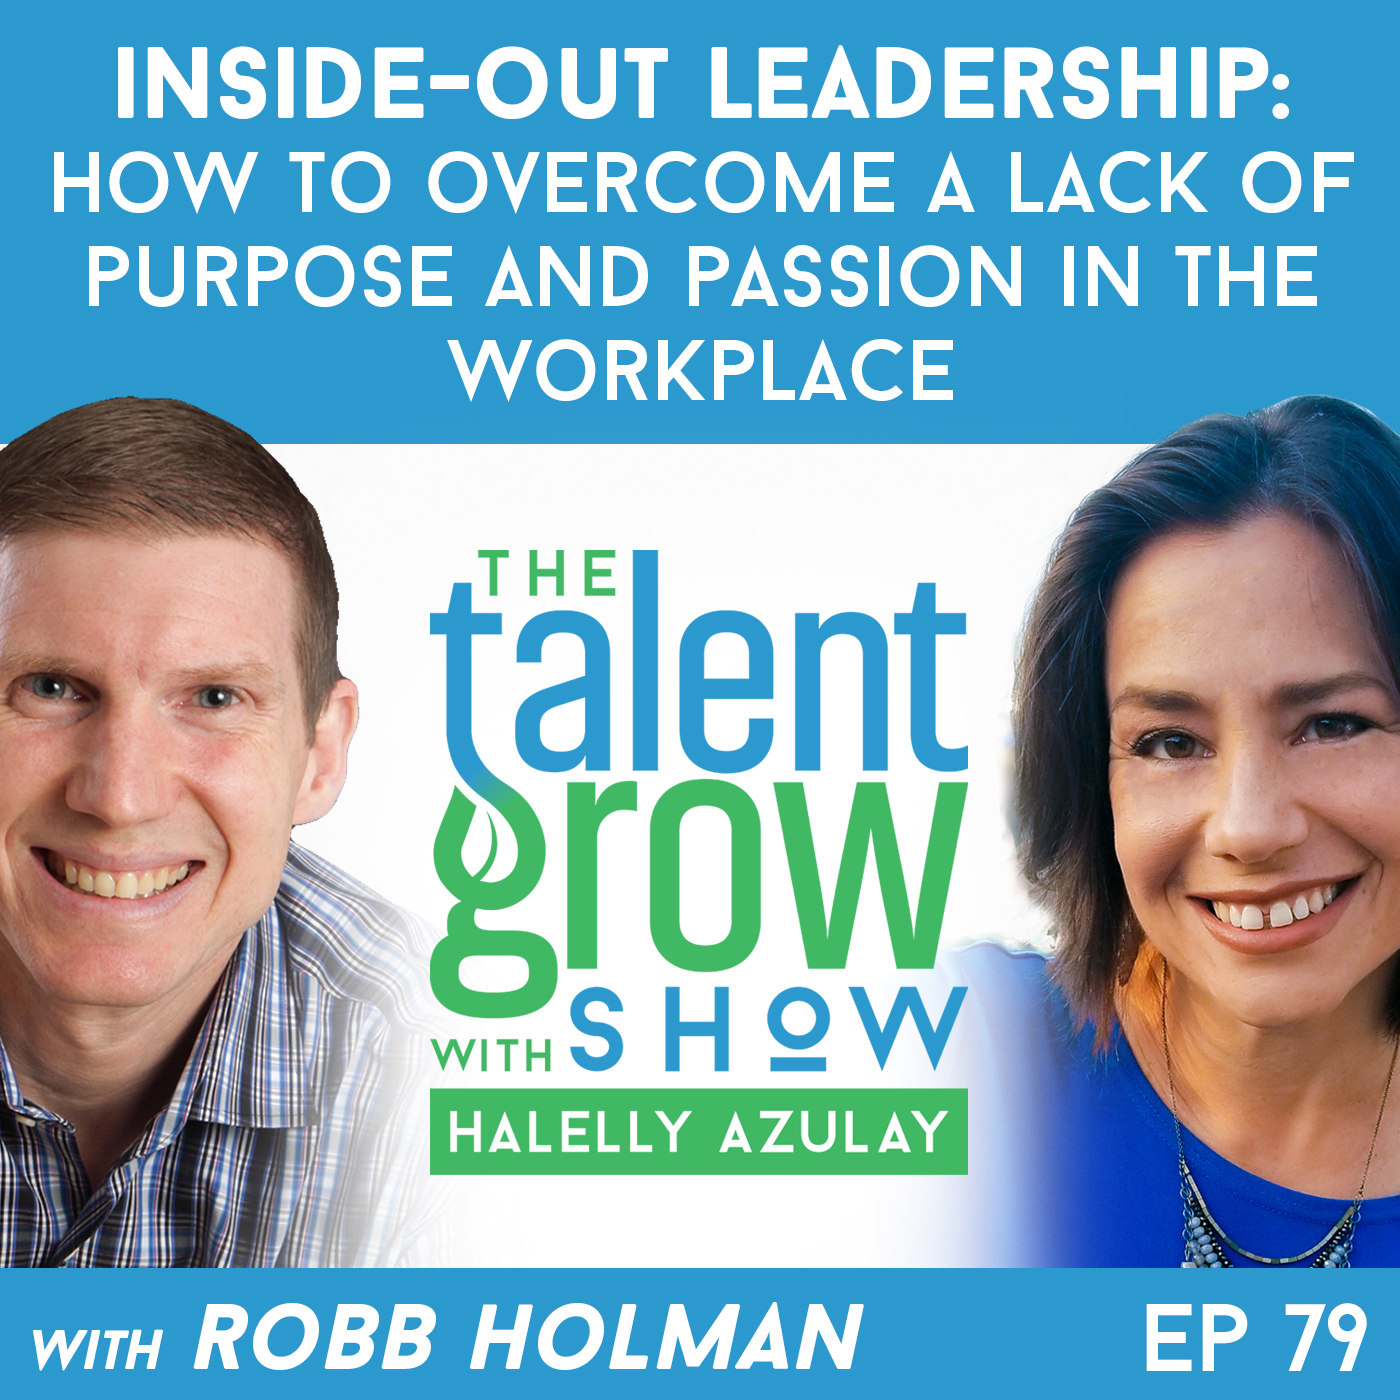 TalentGrow Show EP 79 Robb Holman Square